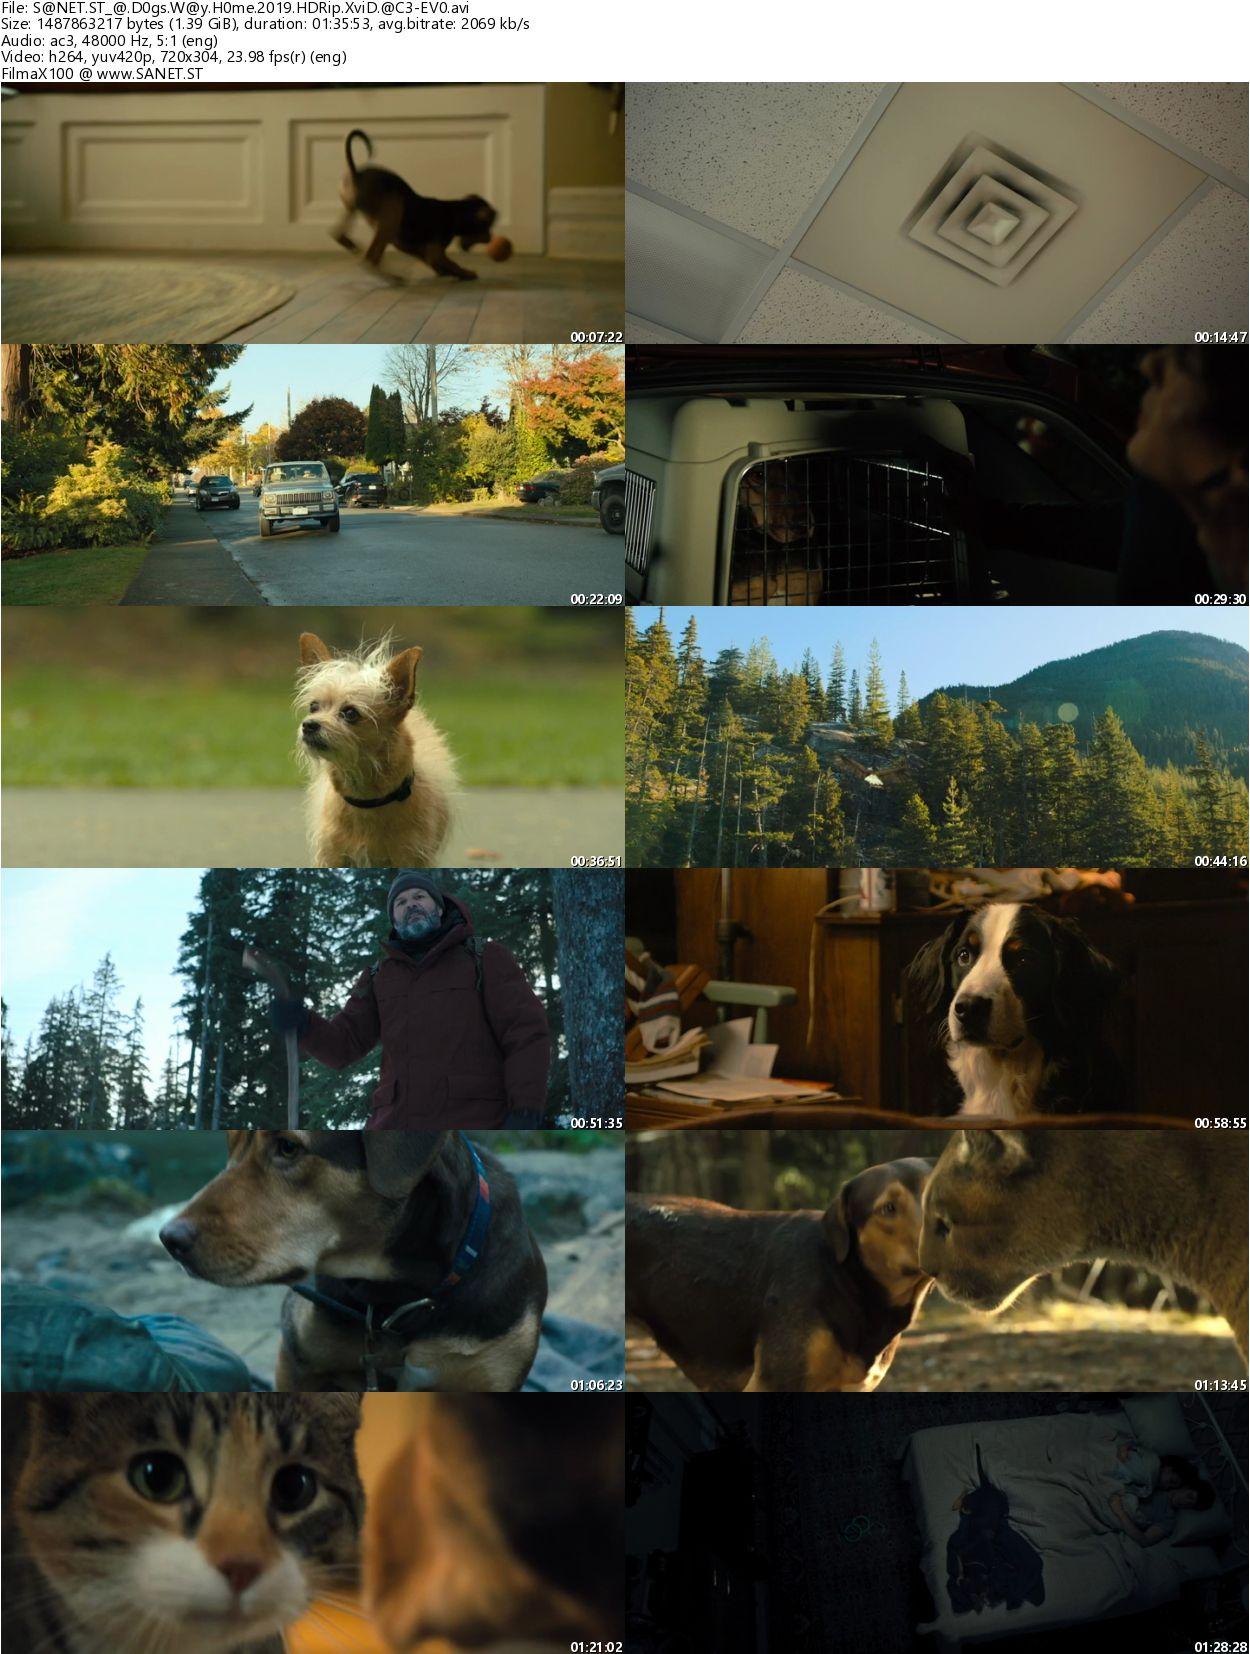 A Dogs Way Home 2019 2 دانلود دوبله فارسی فیلم دیدنی و جذاب A Dogs Way Home 2019